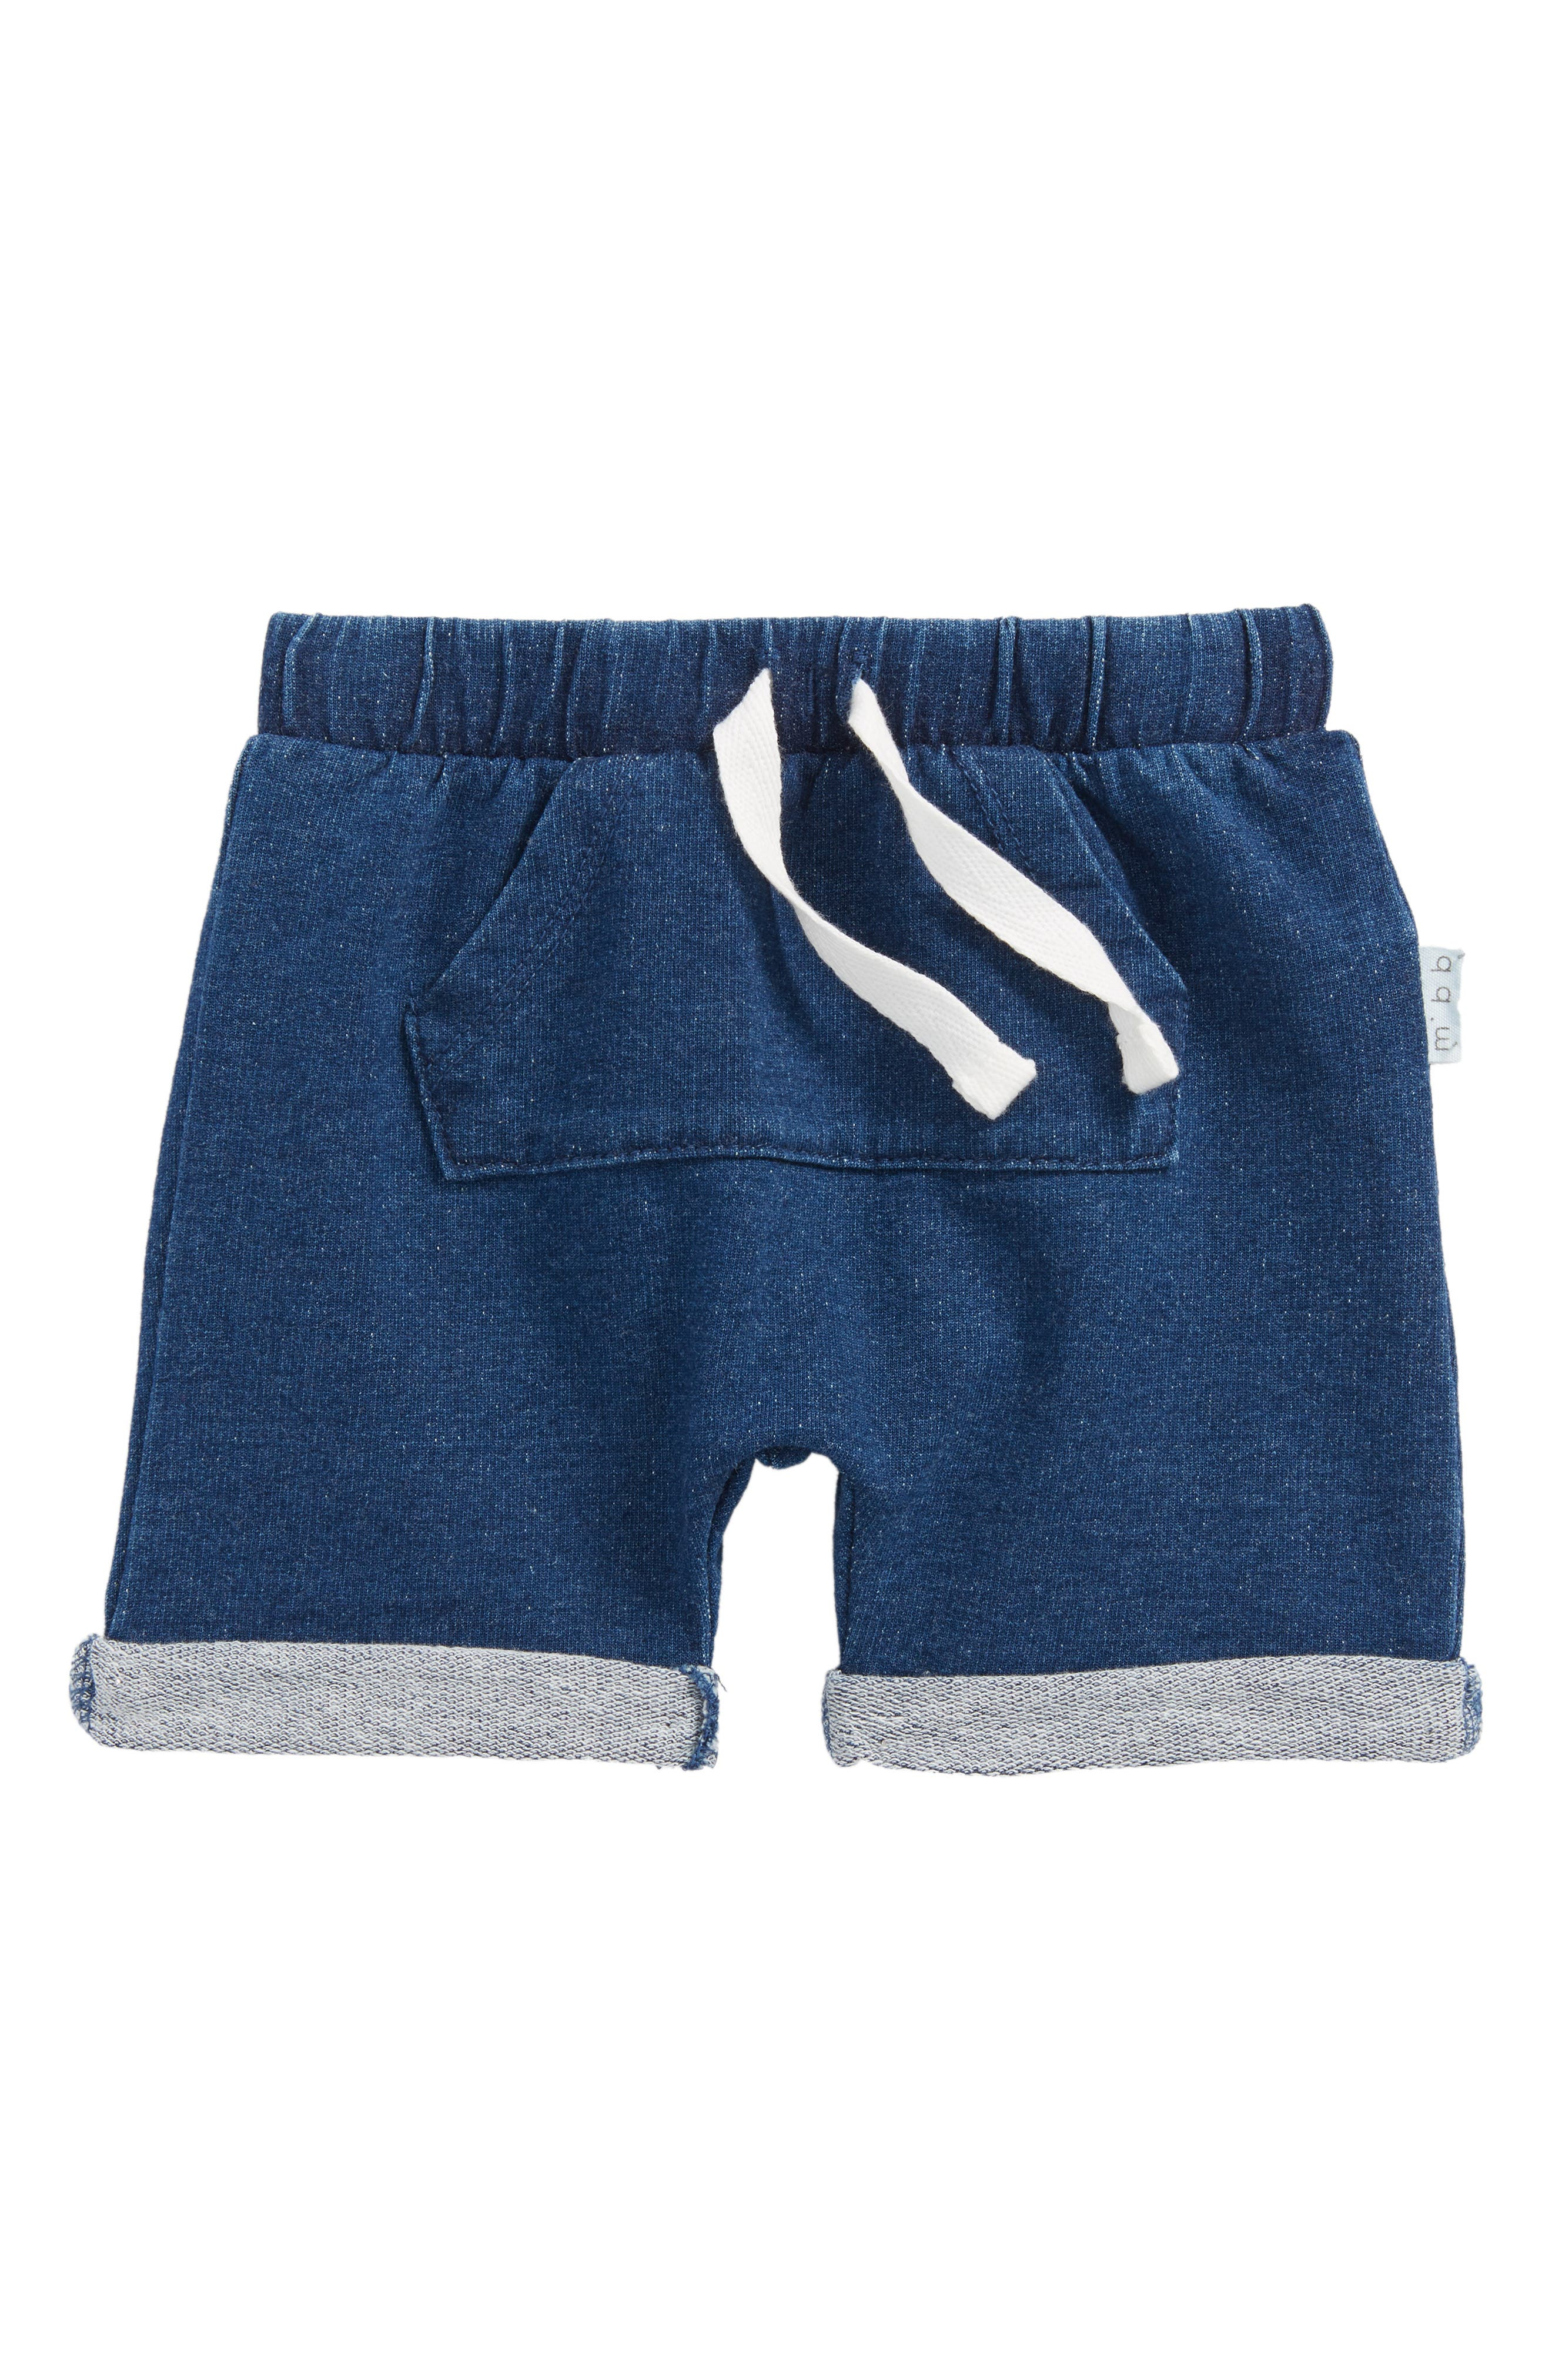 Denim Look Shorts,                         Main,                         color, 400